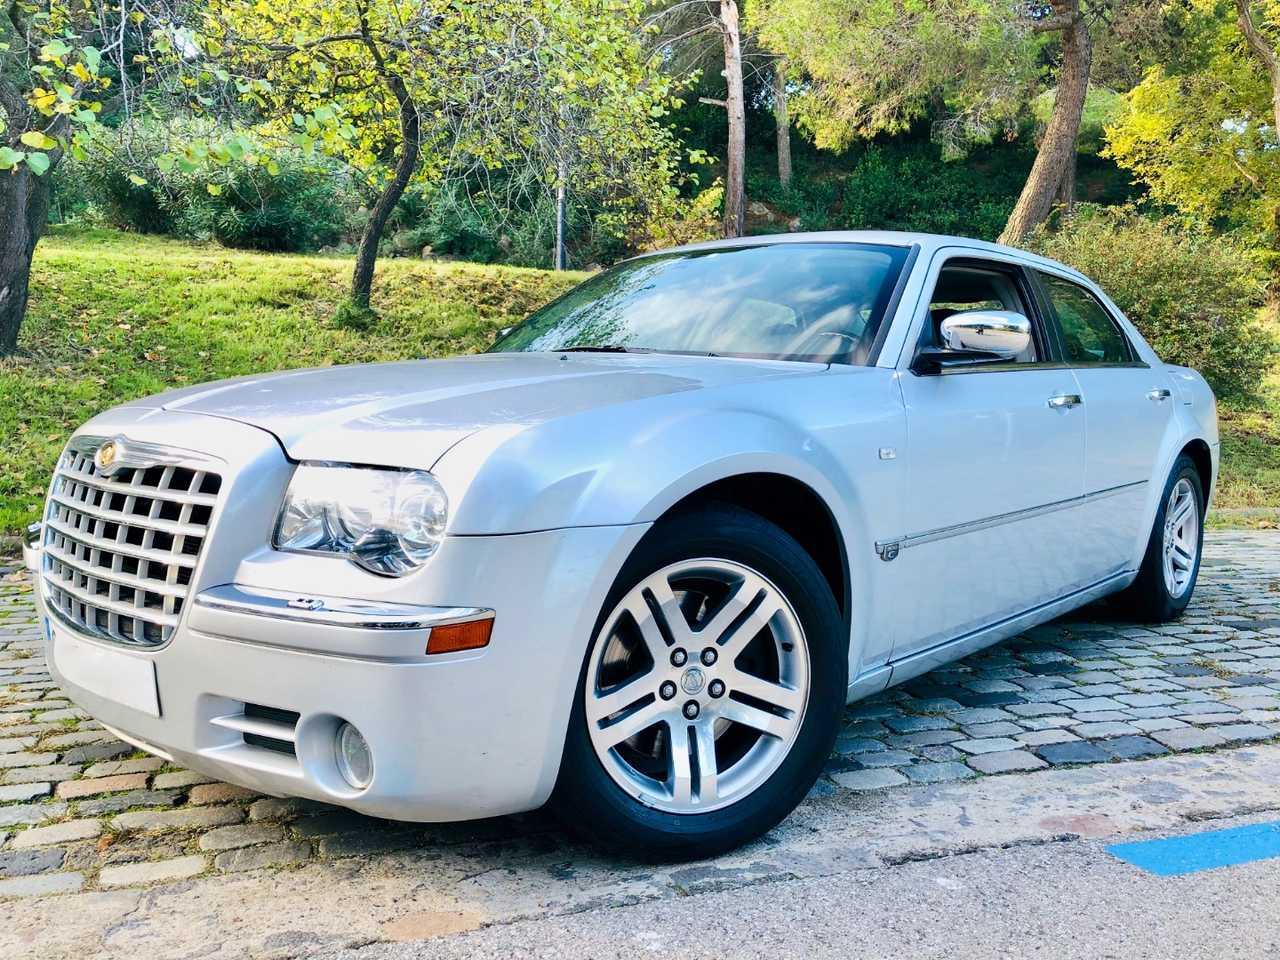 Chrysler 300 C 2.7 V6 193CV Automático.   - Foto 1